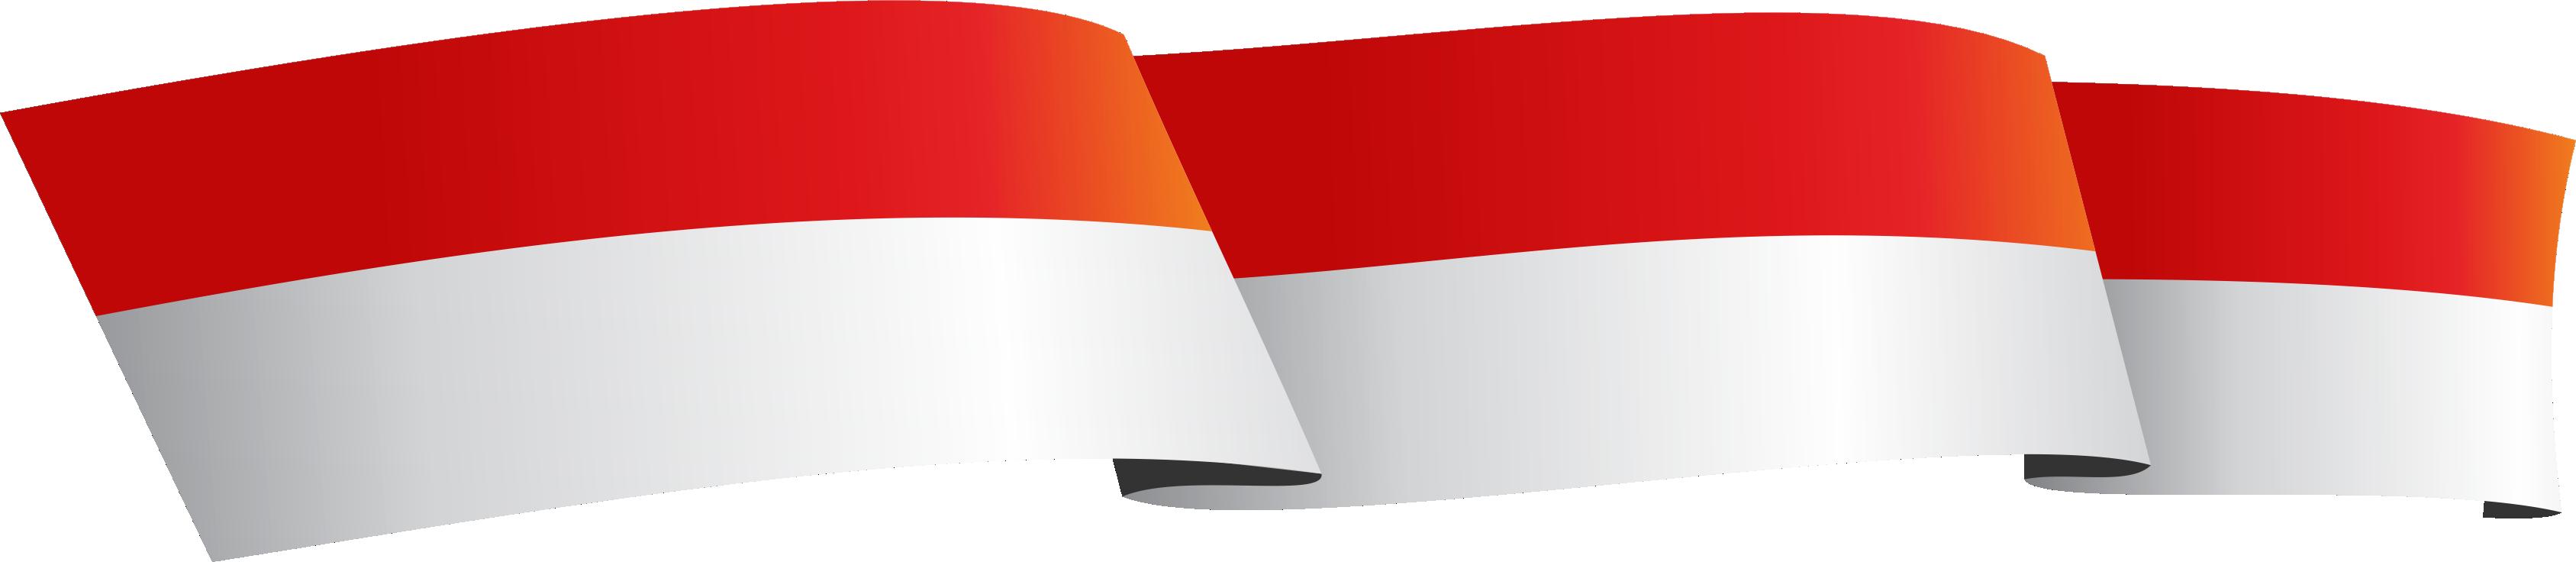 Bendera indonesia clipart free library Bendera indonesia vector free download free library